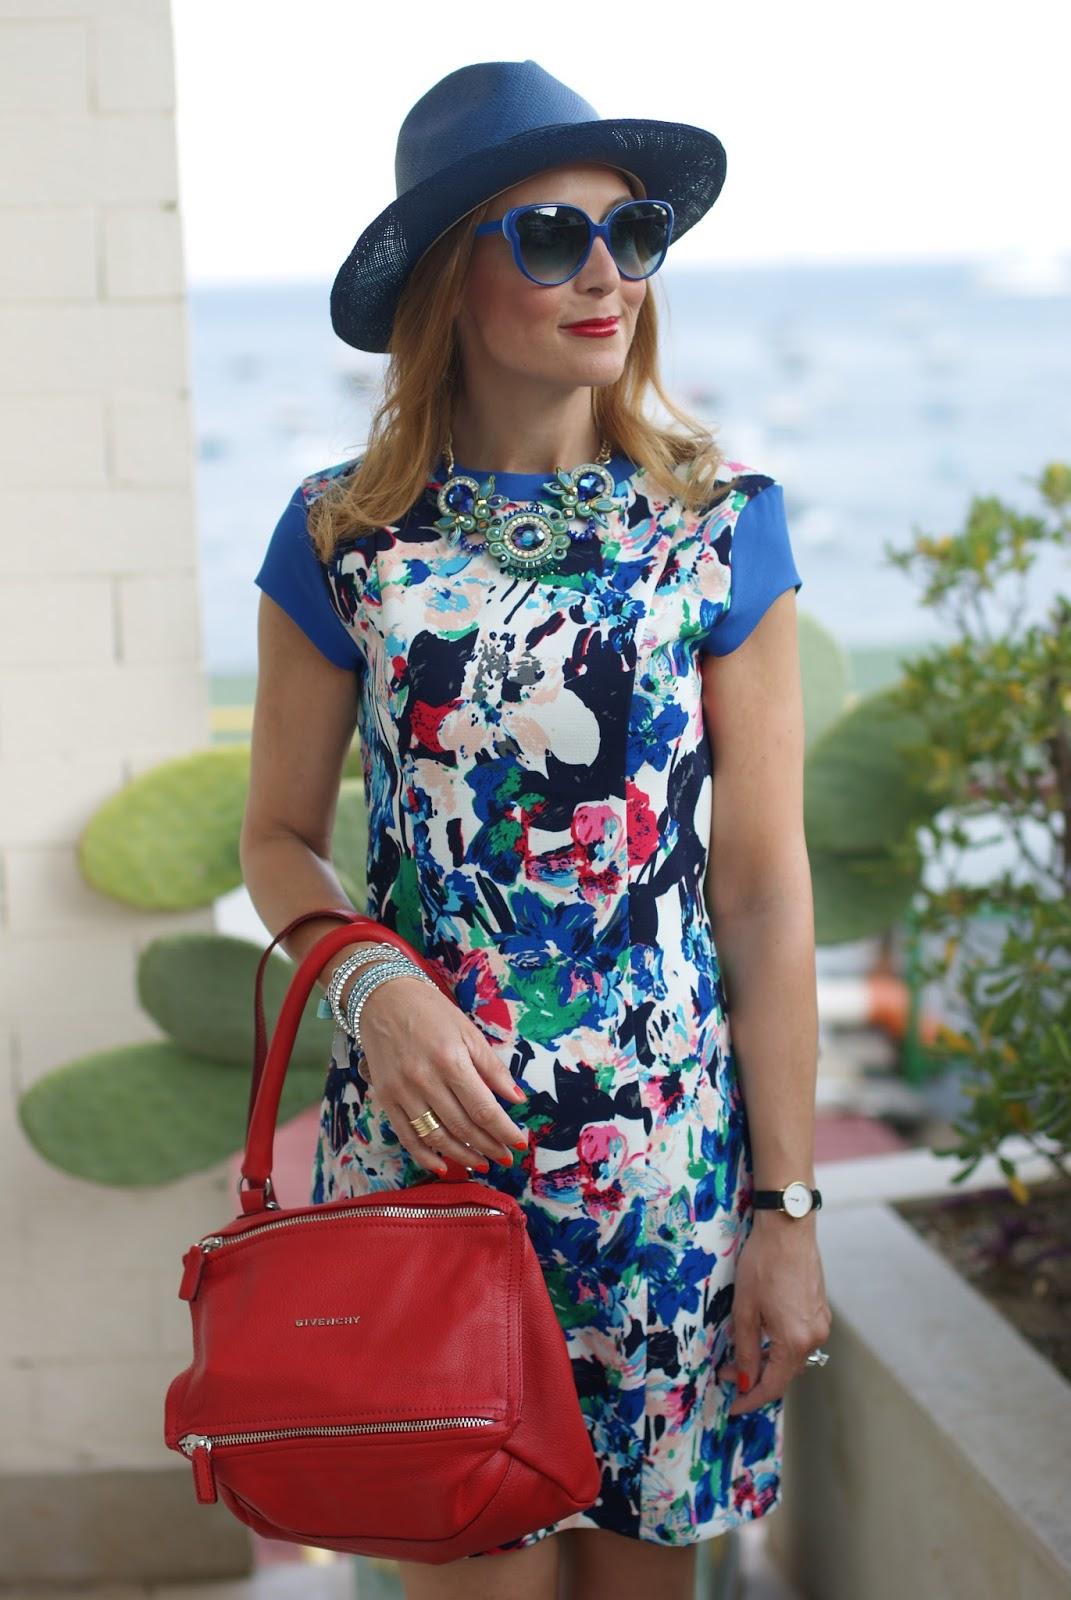 Mismash Ela dress and Givenchy Pandora bag on Fashion and Cookies fashion blog